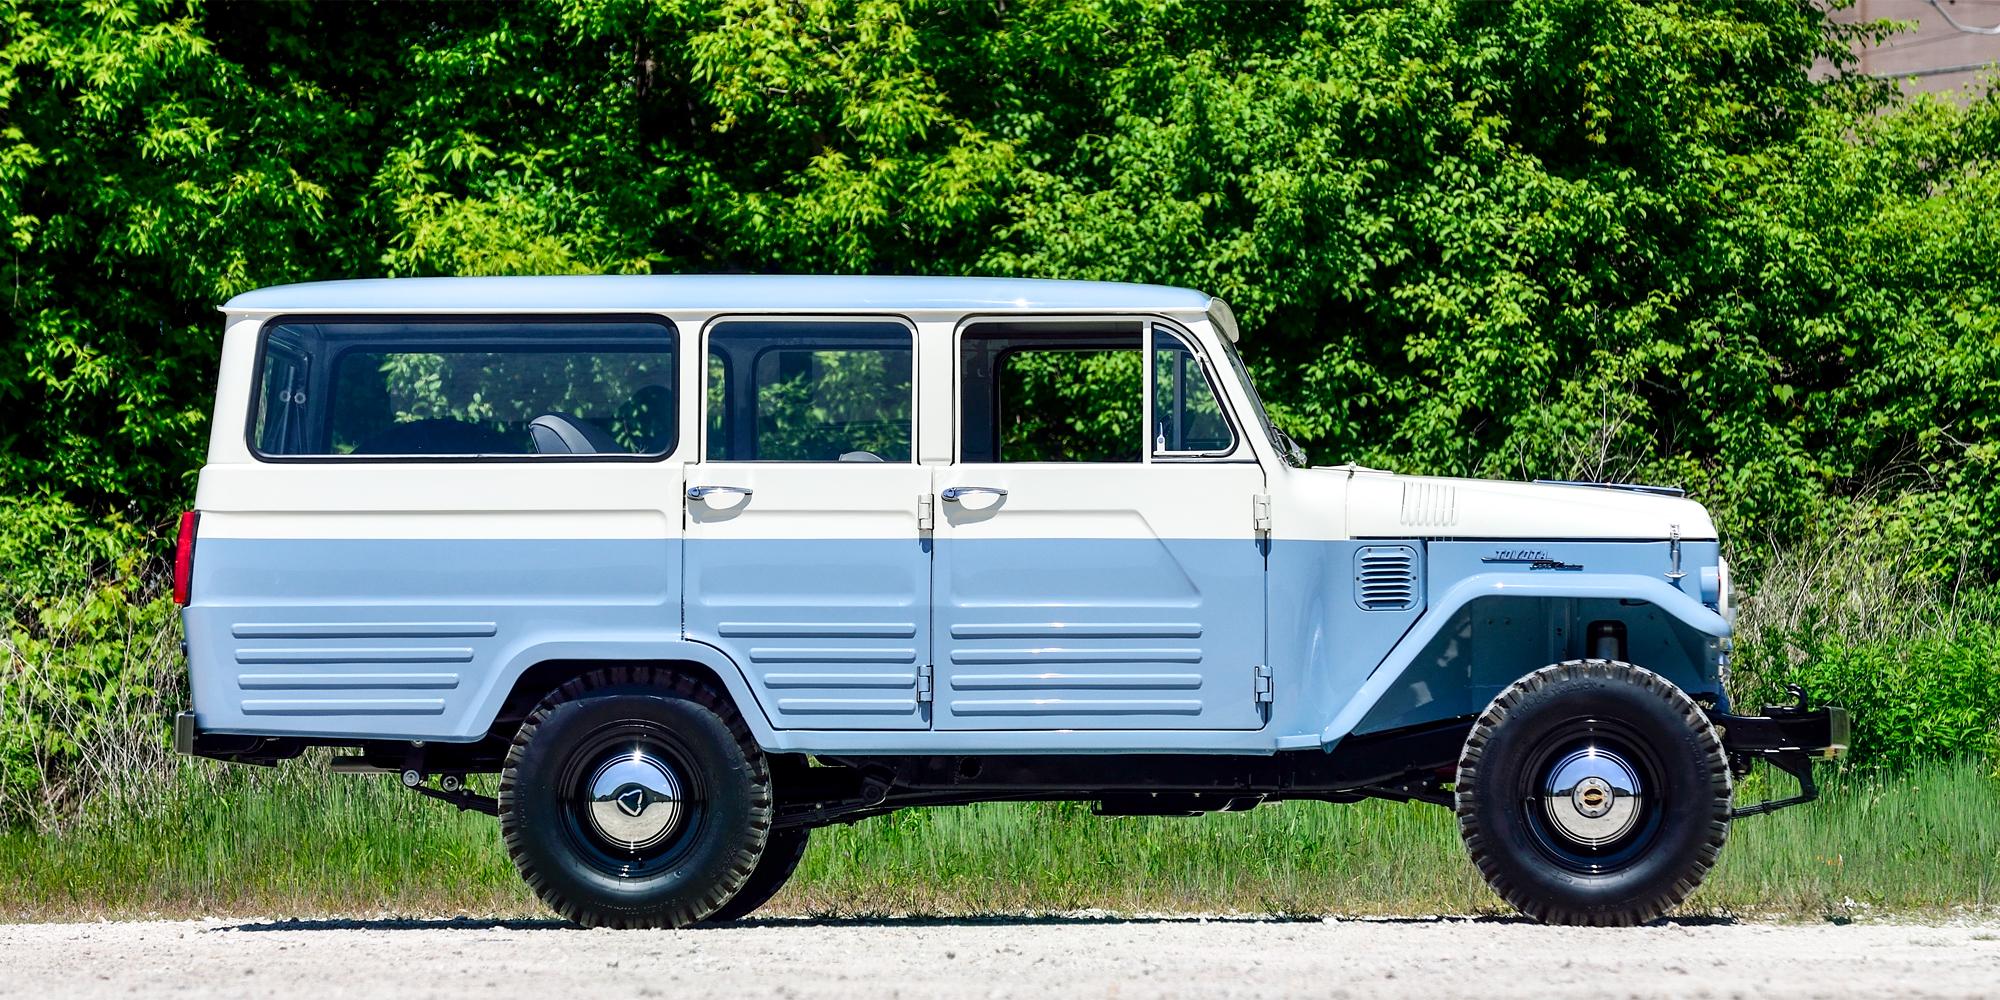 Roa Dpt Bootcolin on Best Old Images On Pinterest Jeep Wrangler Land Cruiser